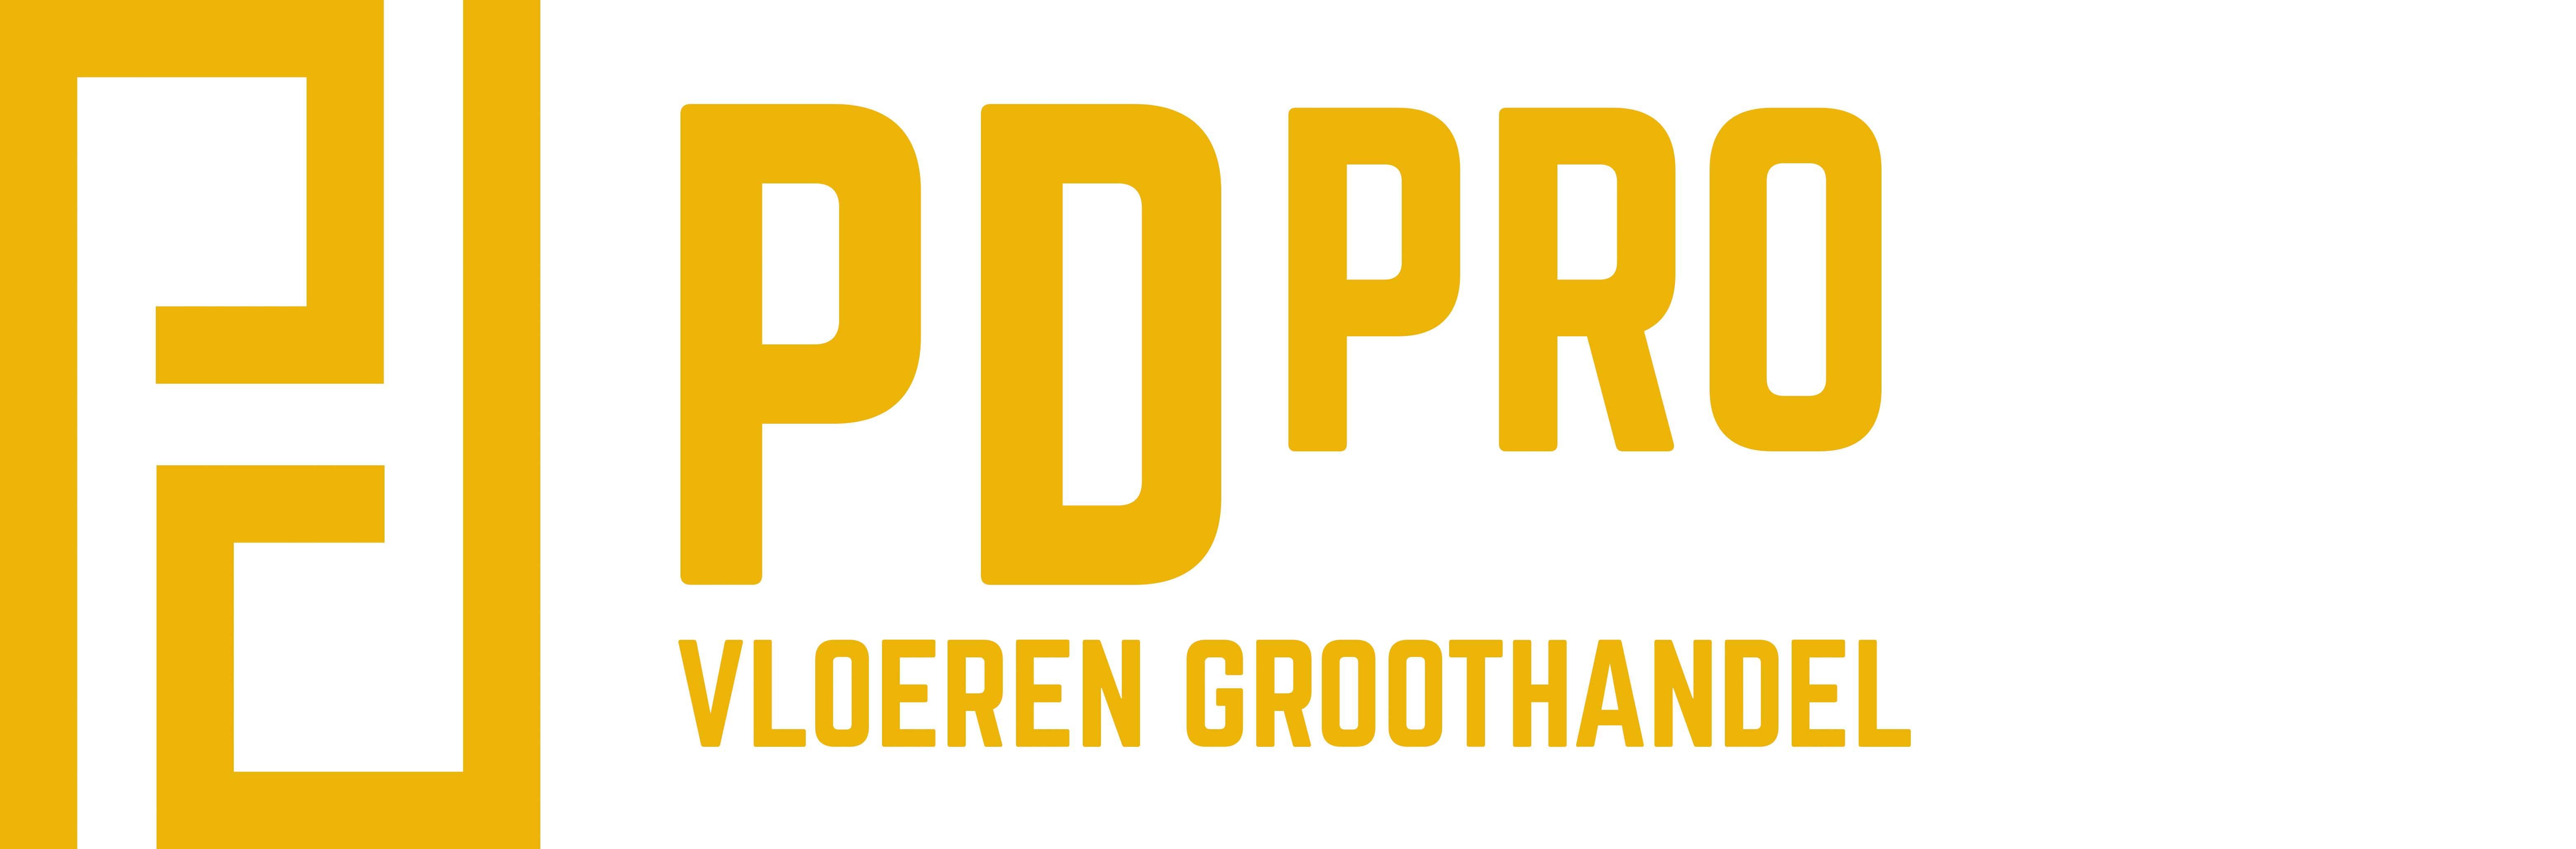 PDpro